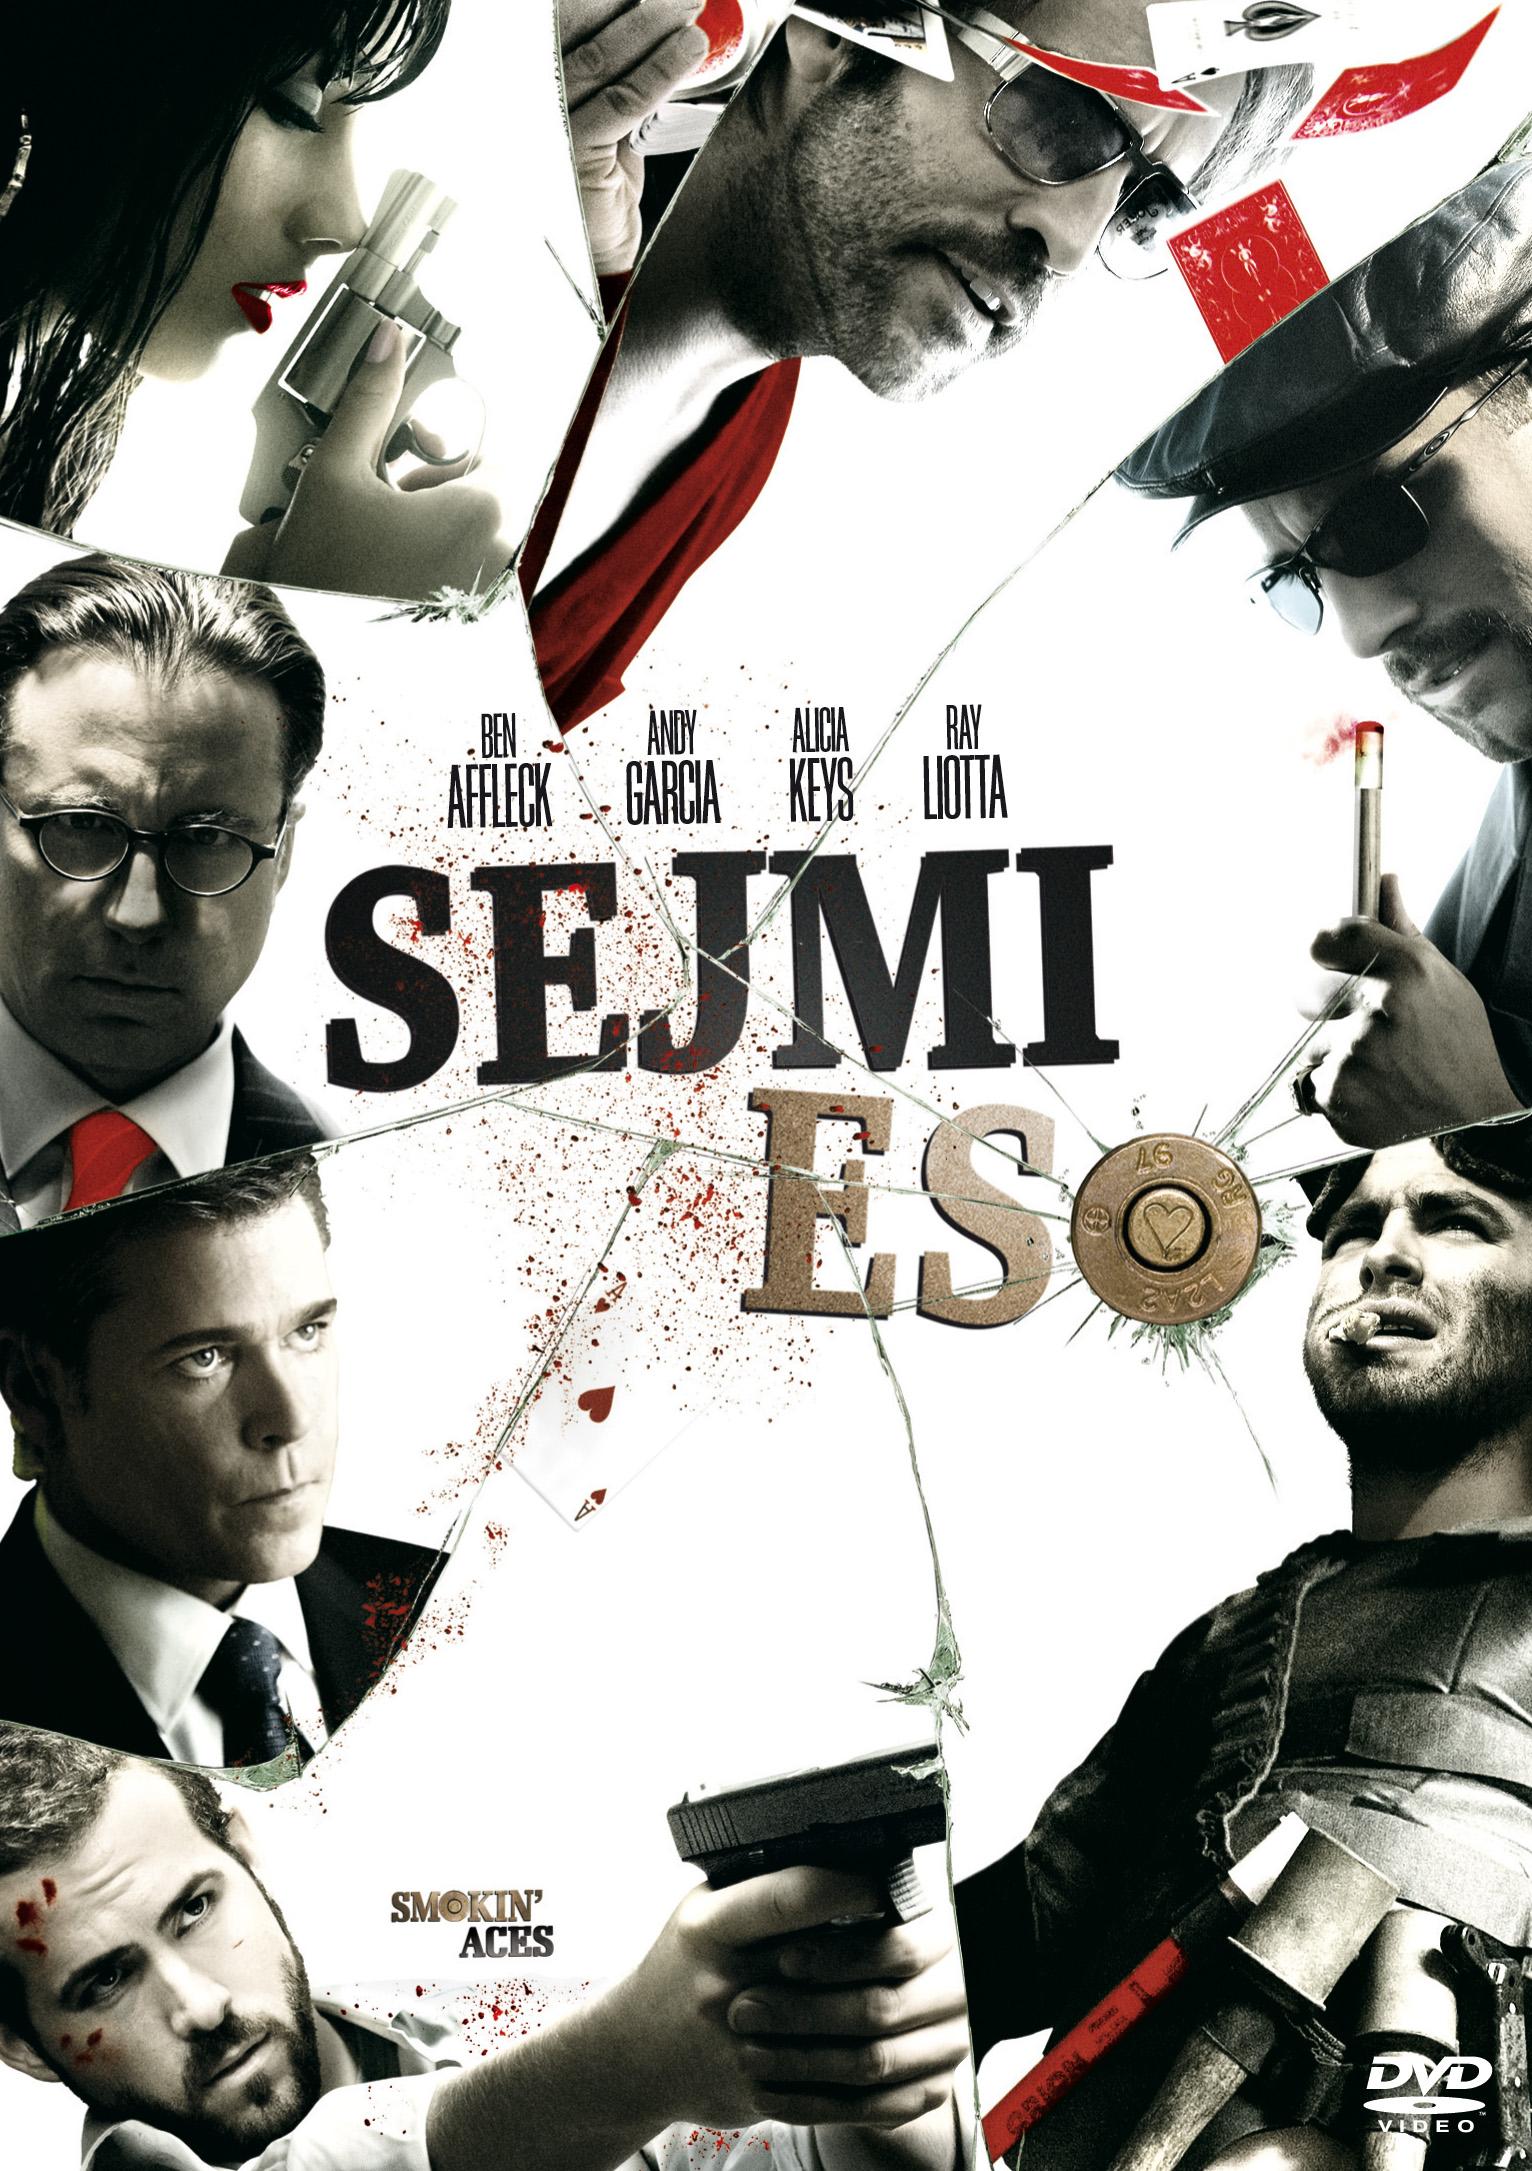 Online film Sejmi eso > Drama filmy | vsetu.eu zdarma ... Cutey Cubes